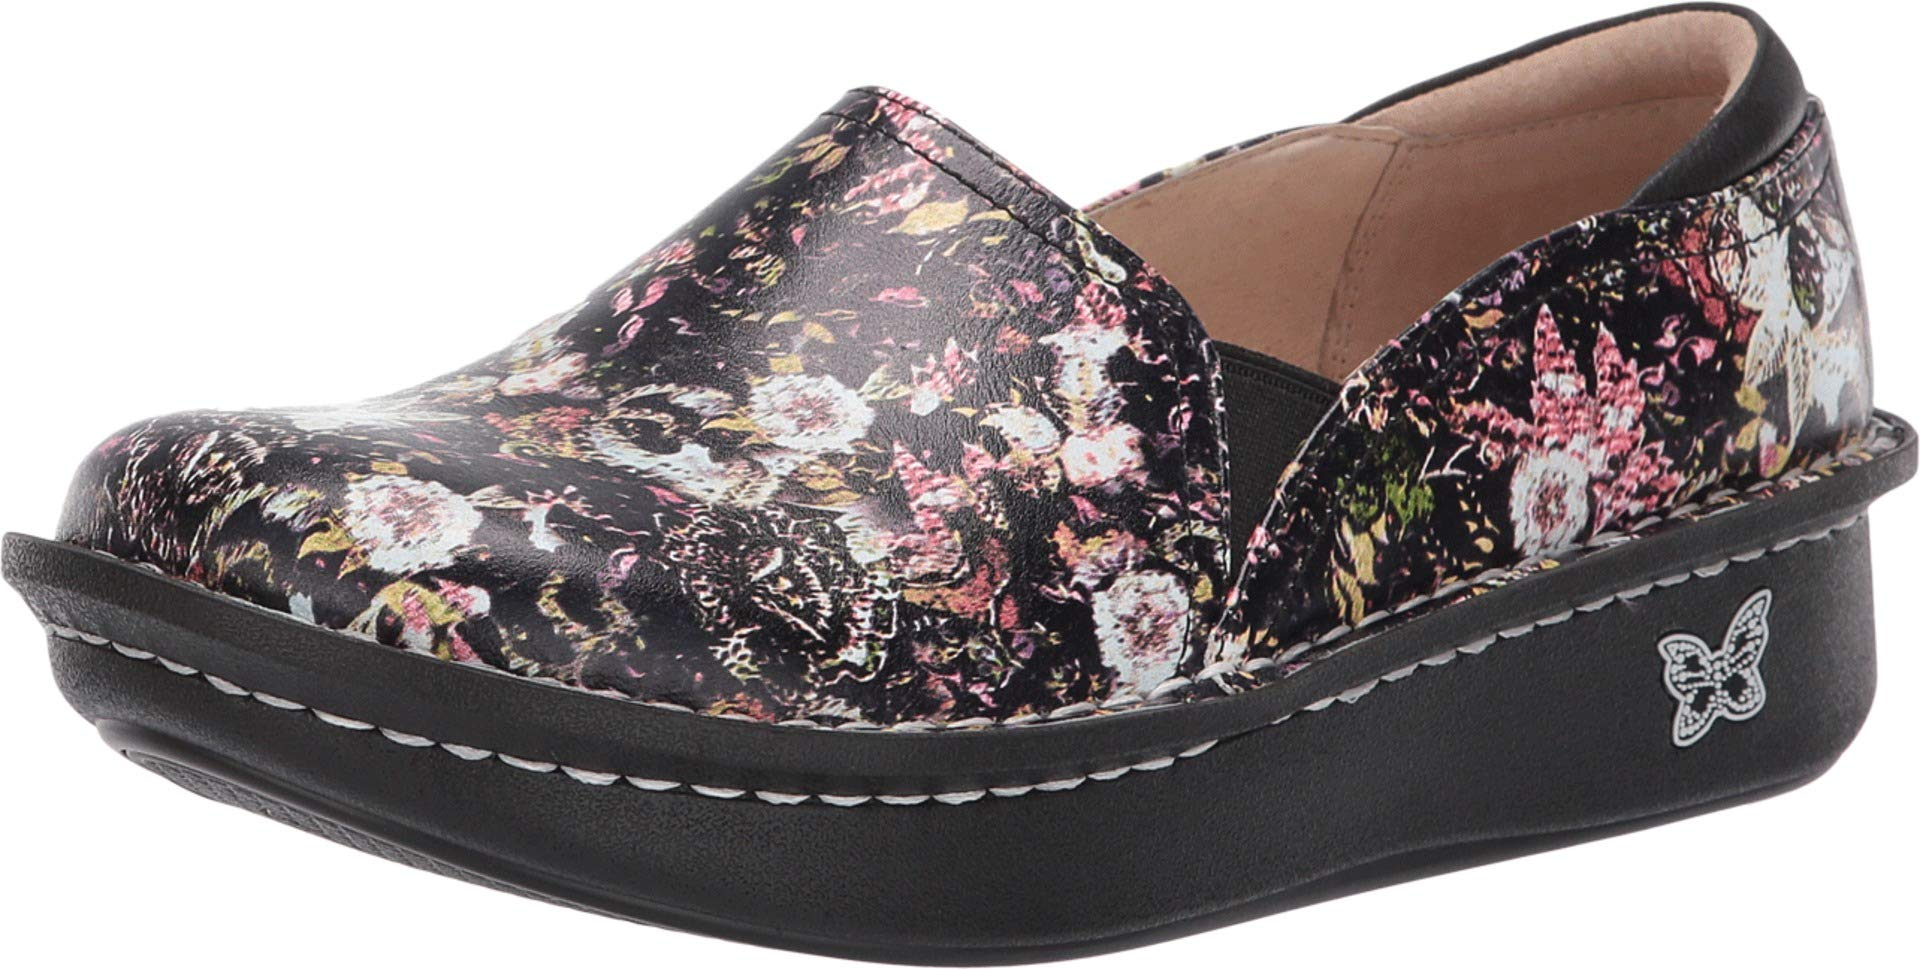 Alegria Debra Womens Slip-On Shoe